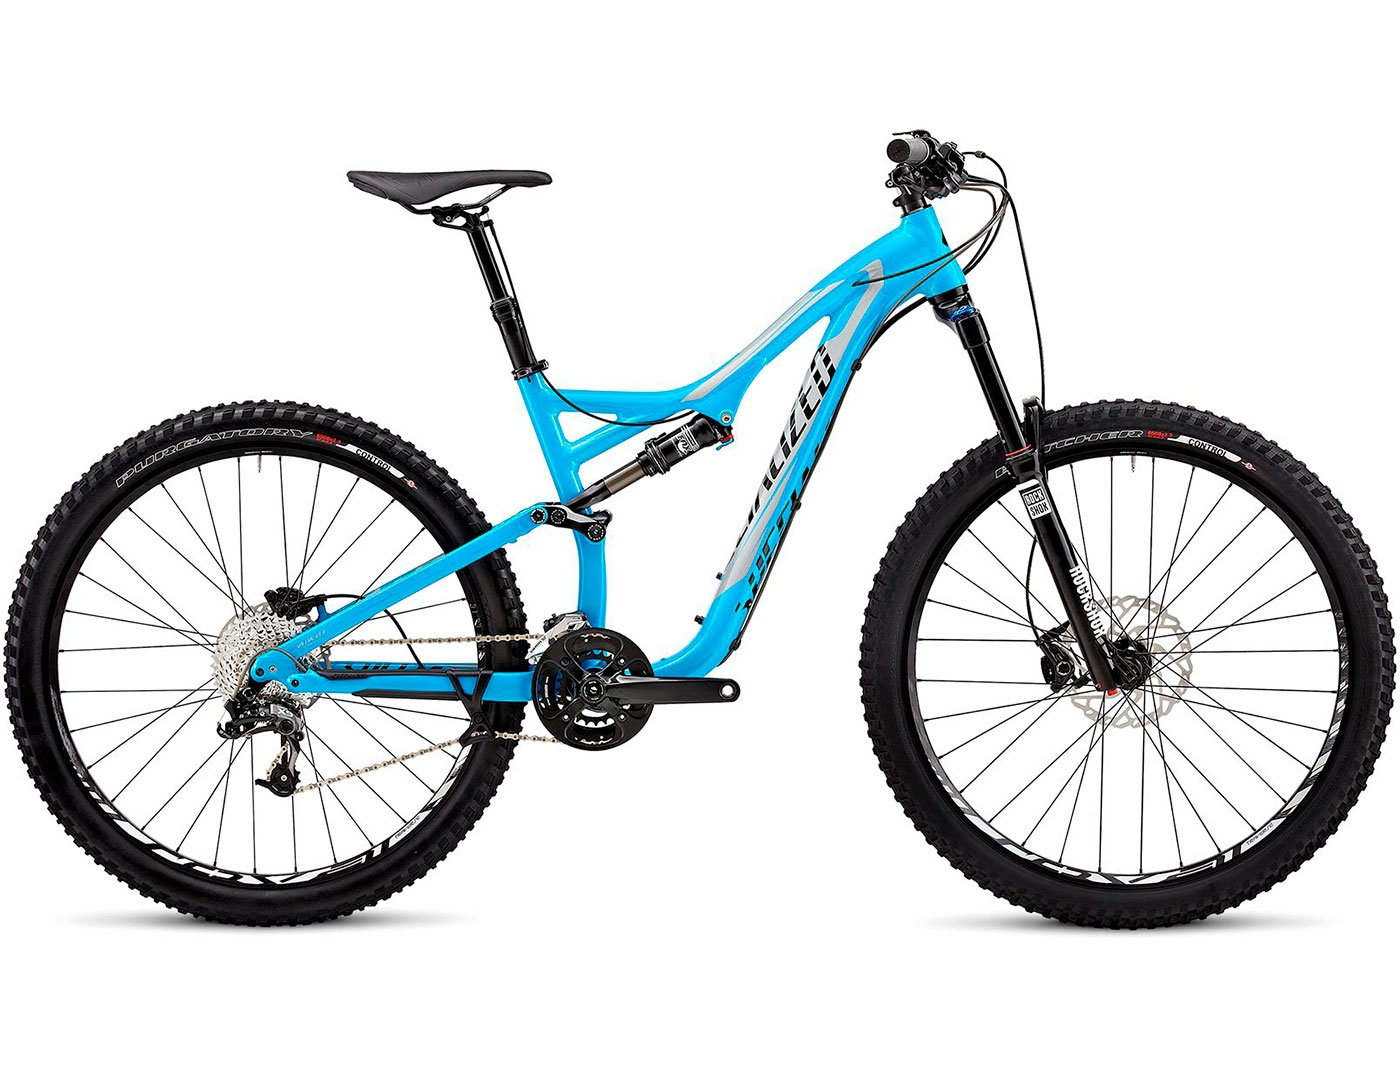 Велосипед Specialized Stumpjumper Fsr Comp Evo 650B (2015)